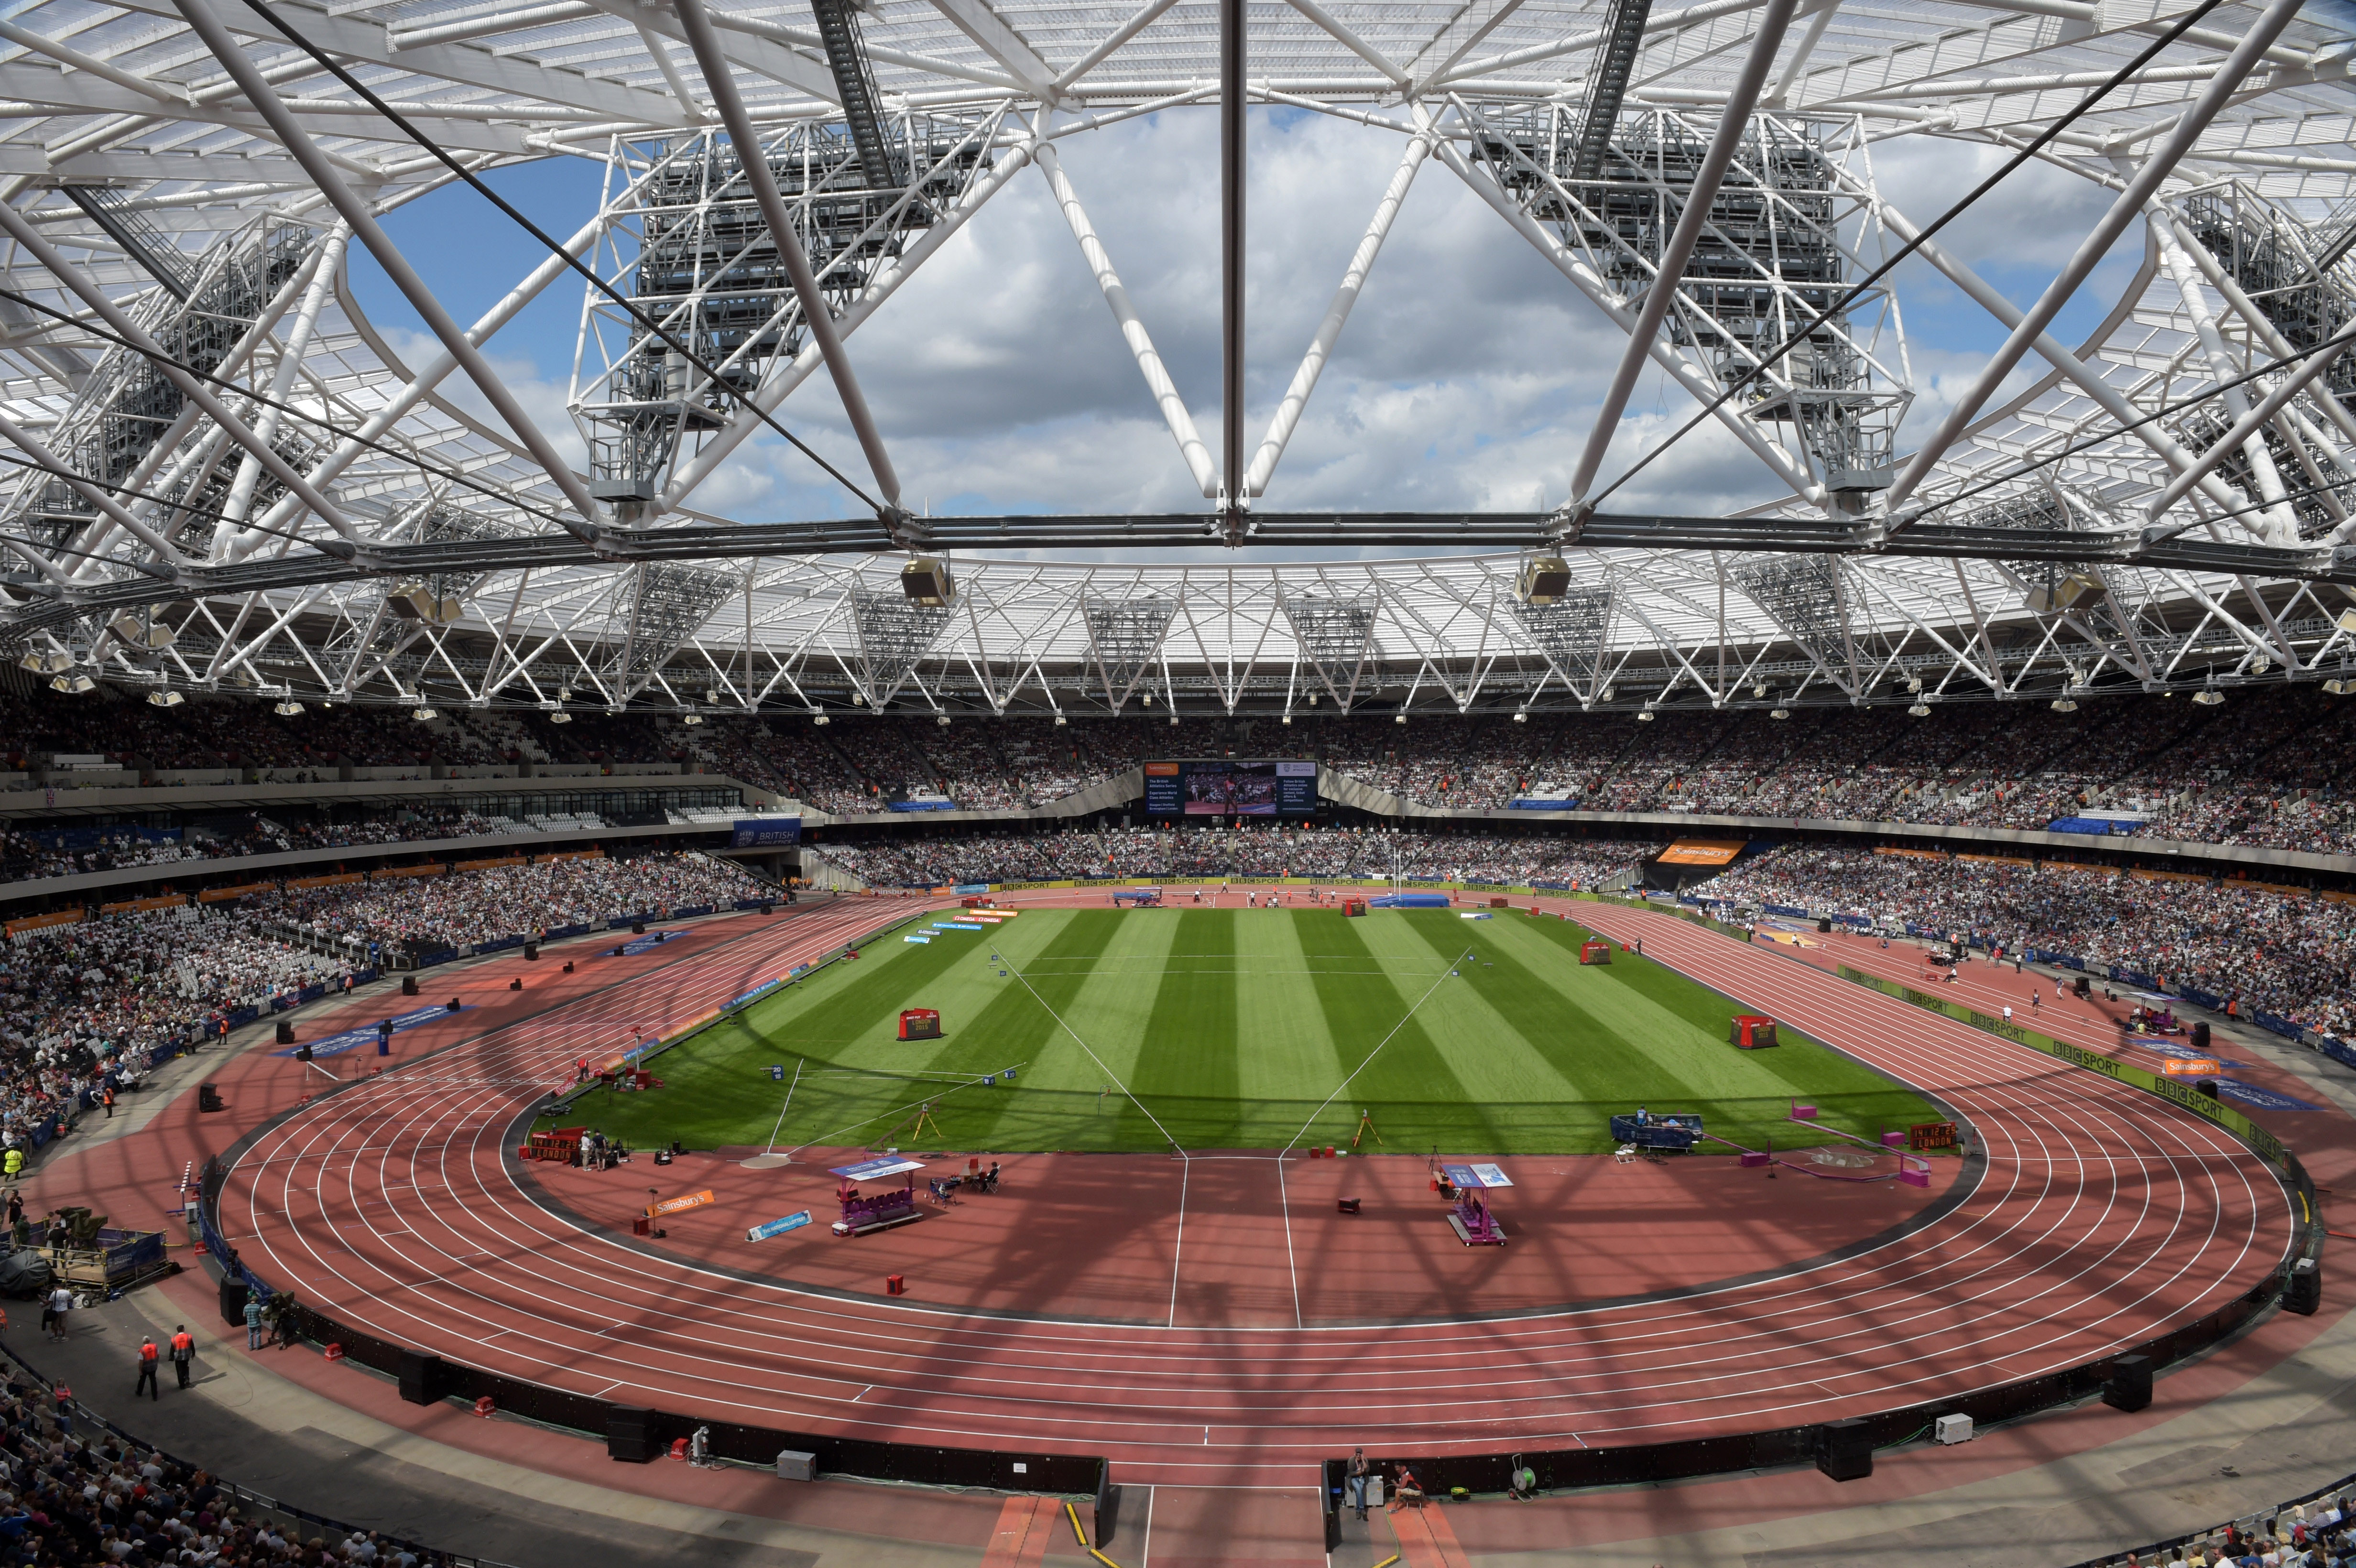 Could London's Olympic Stadium host 2017 MLB Regular Season games?